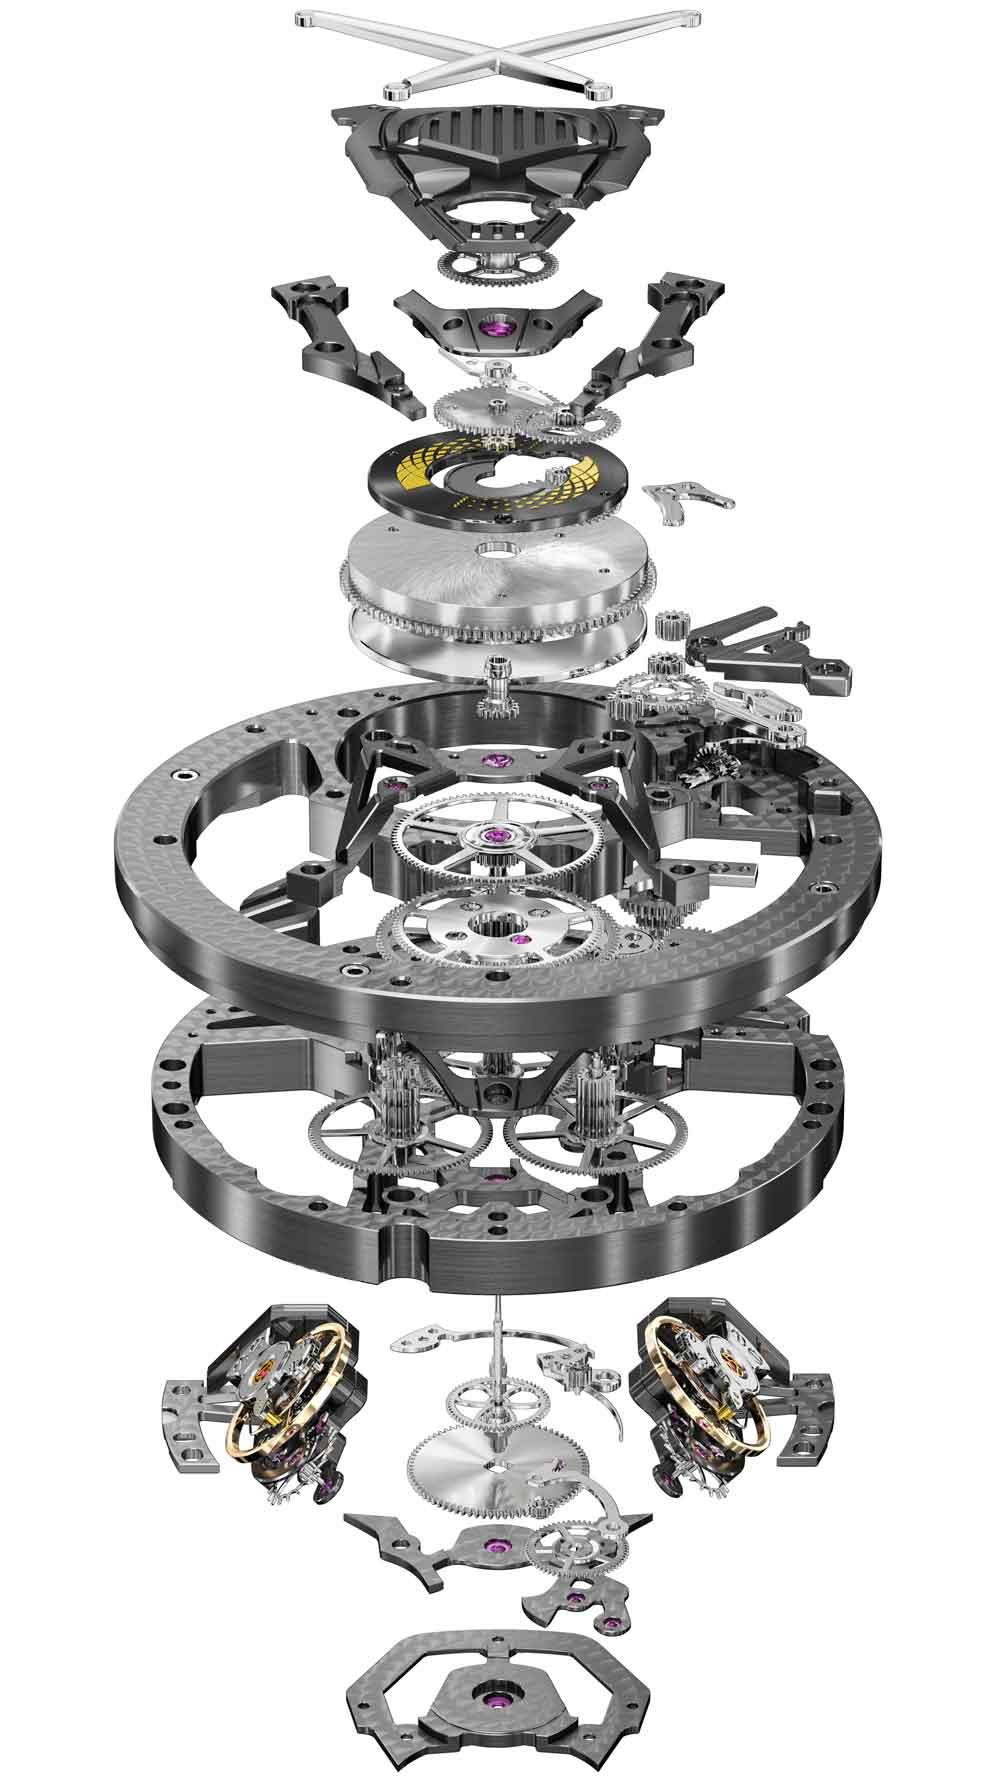 Mecanismo cuerda manual Reloj ROGER DUBUIS EXCALIBUR AVENTADOR S